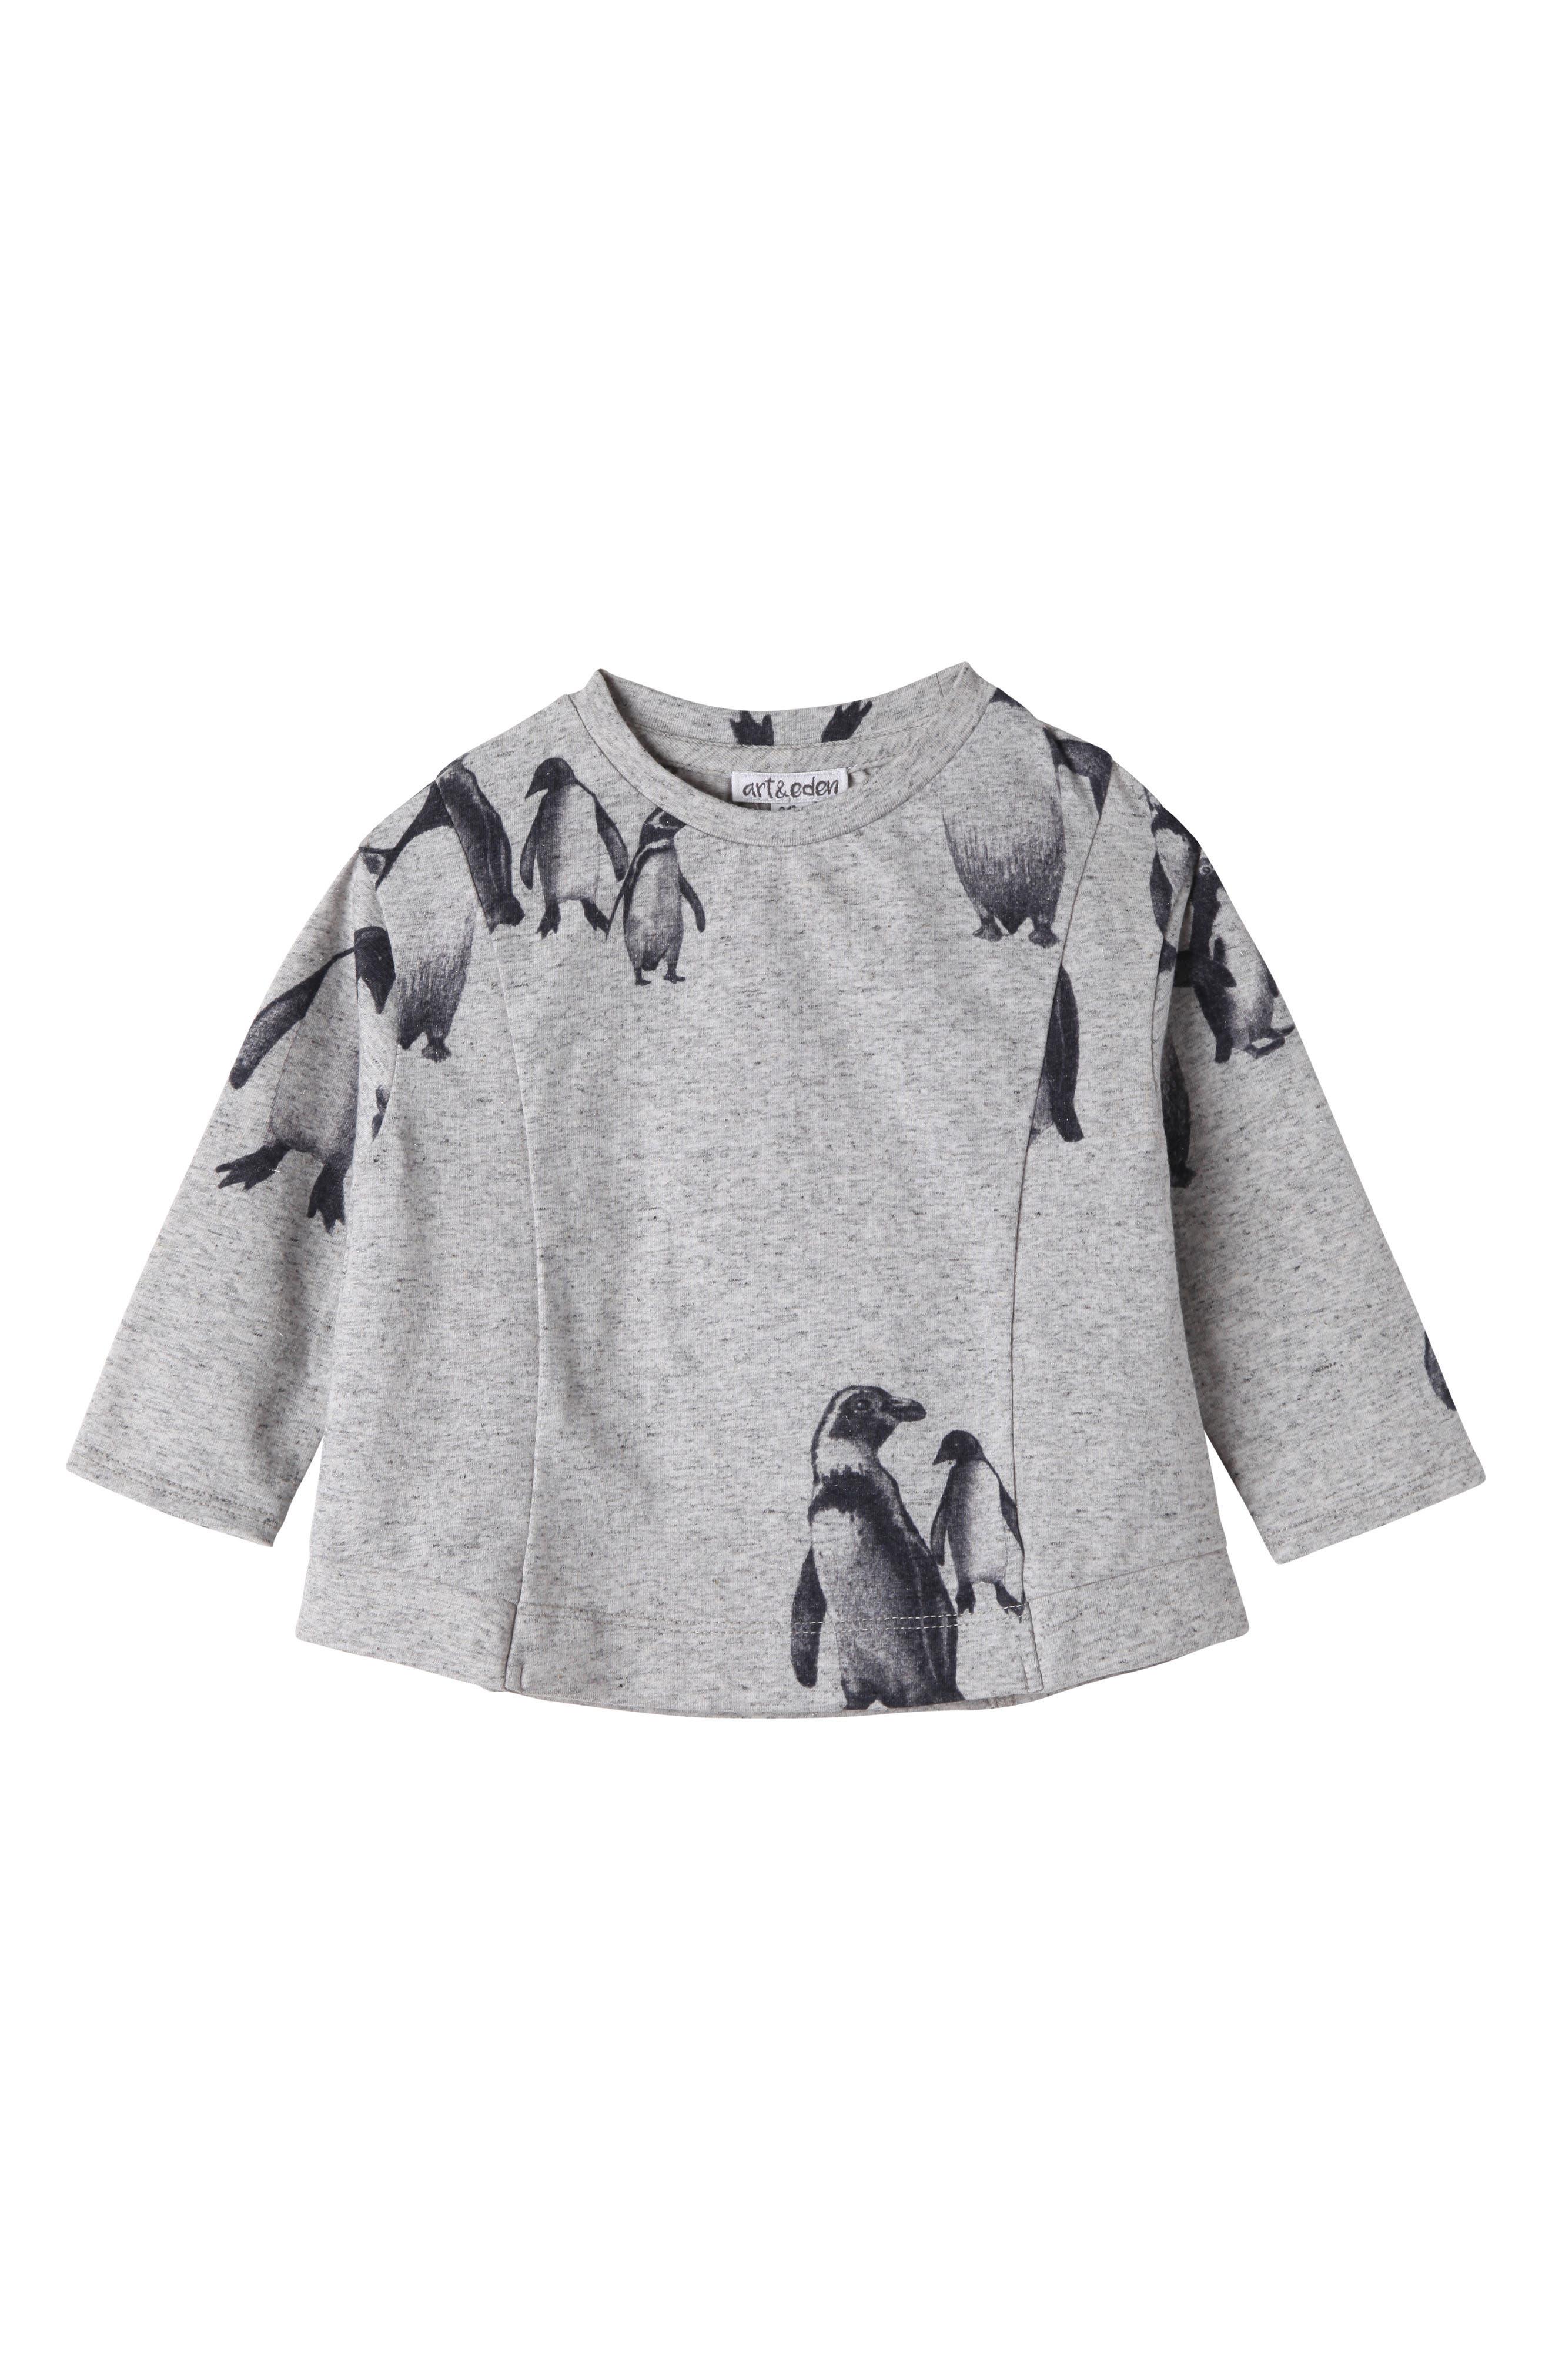 Main Image - Art & Eden Penguin Graphic Tee (Baby Girls)